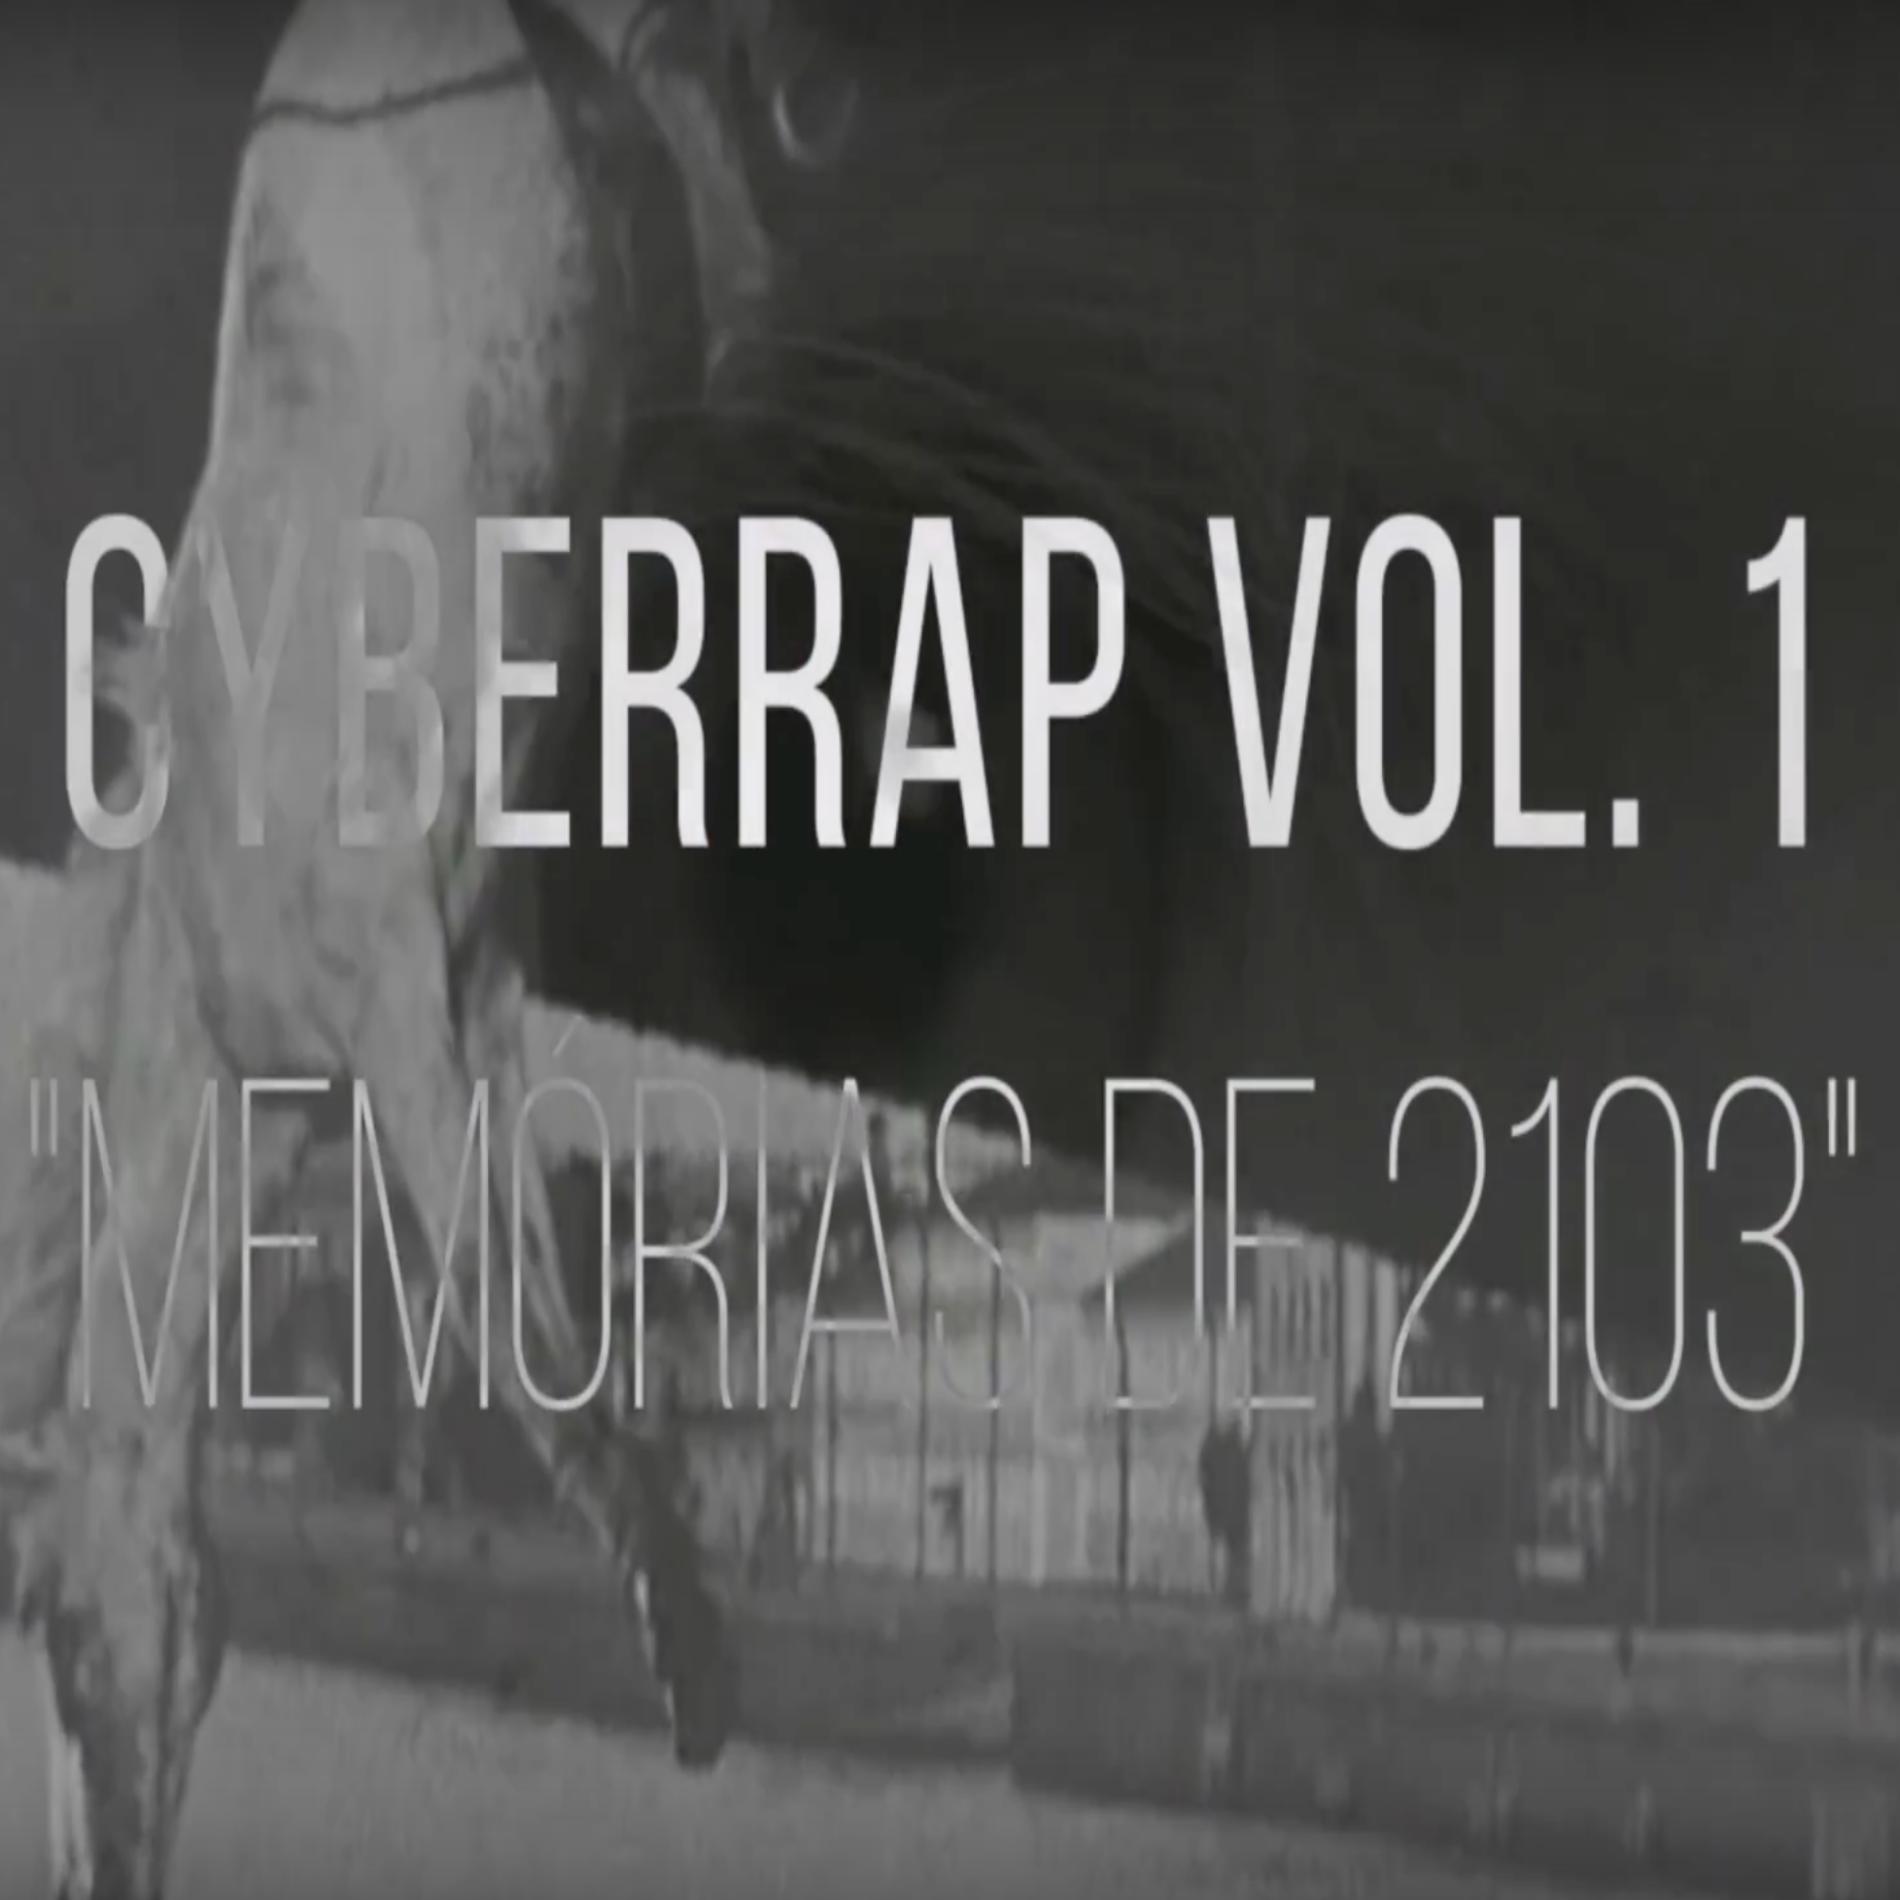 "delvispresley - CYBERRAP - VOL.1 ""Memórias de 2013"""